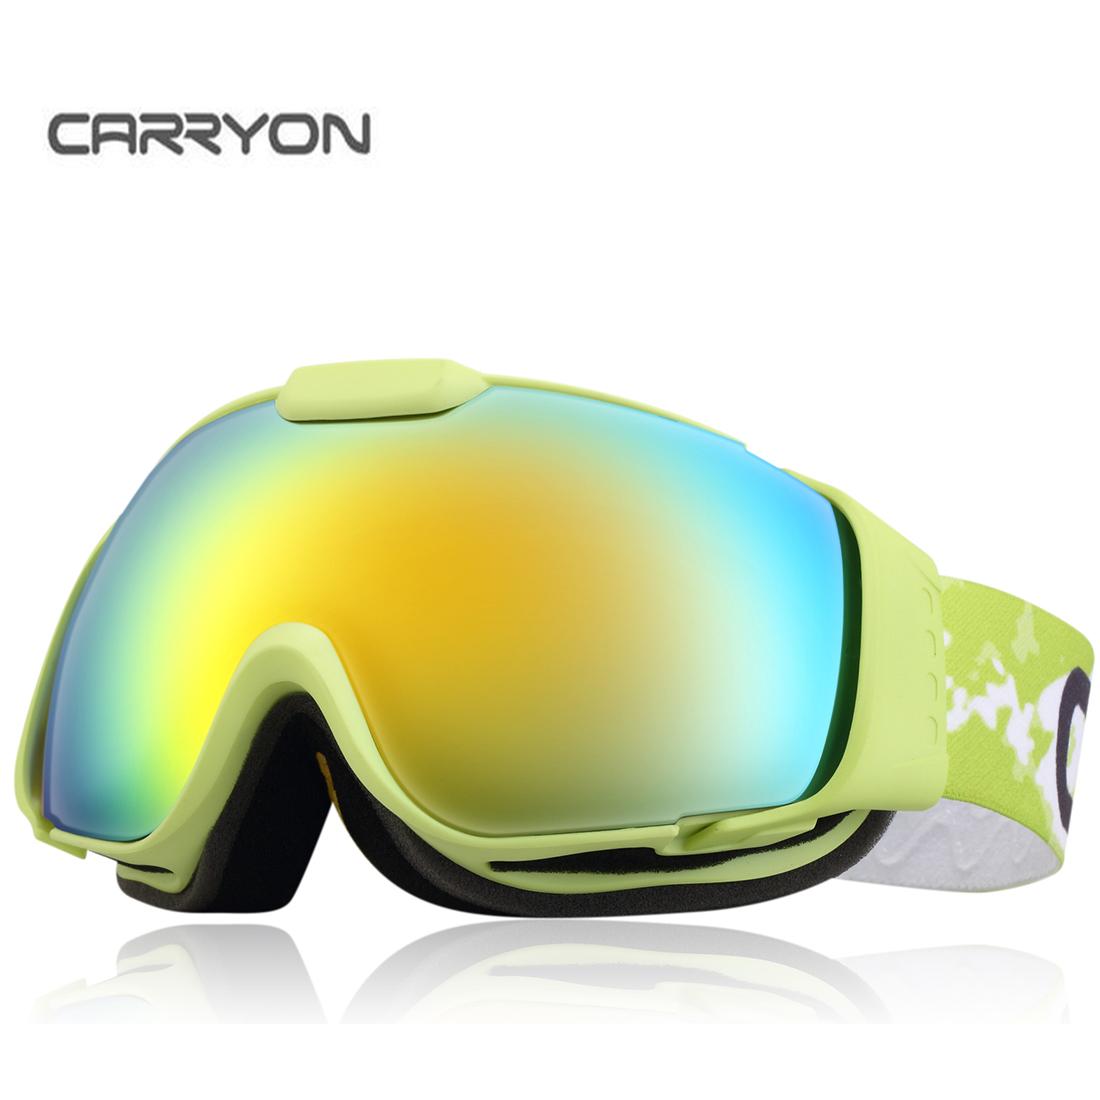 Carryon Authorized Kids Snowboard Goggles Ski Glasses Spherical Lens Anti-fog Anti-slip Strap Green